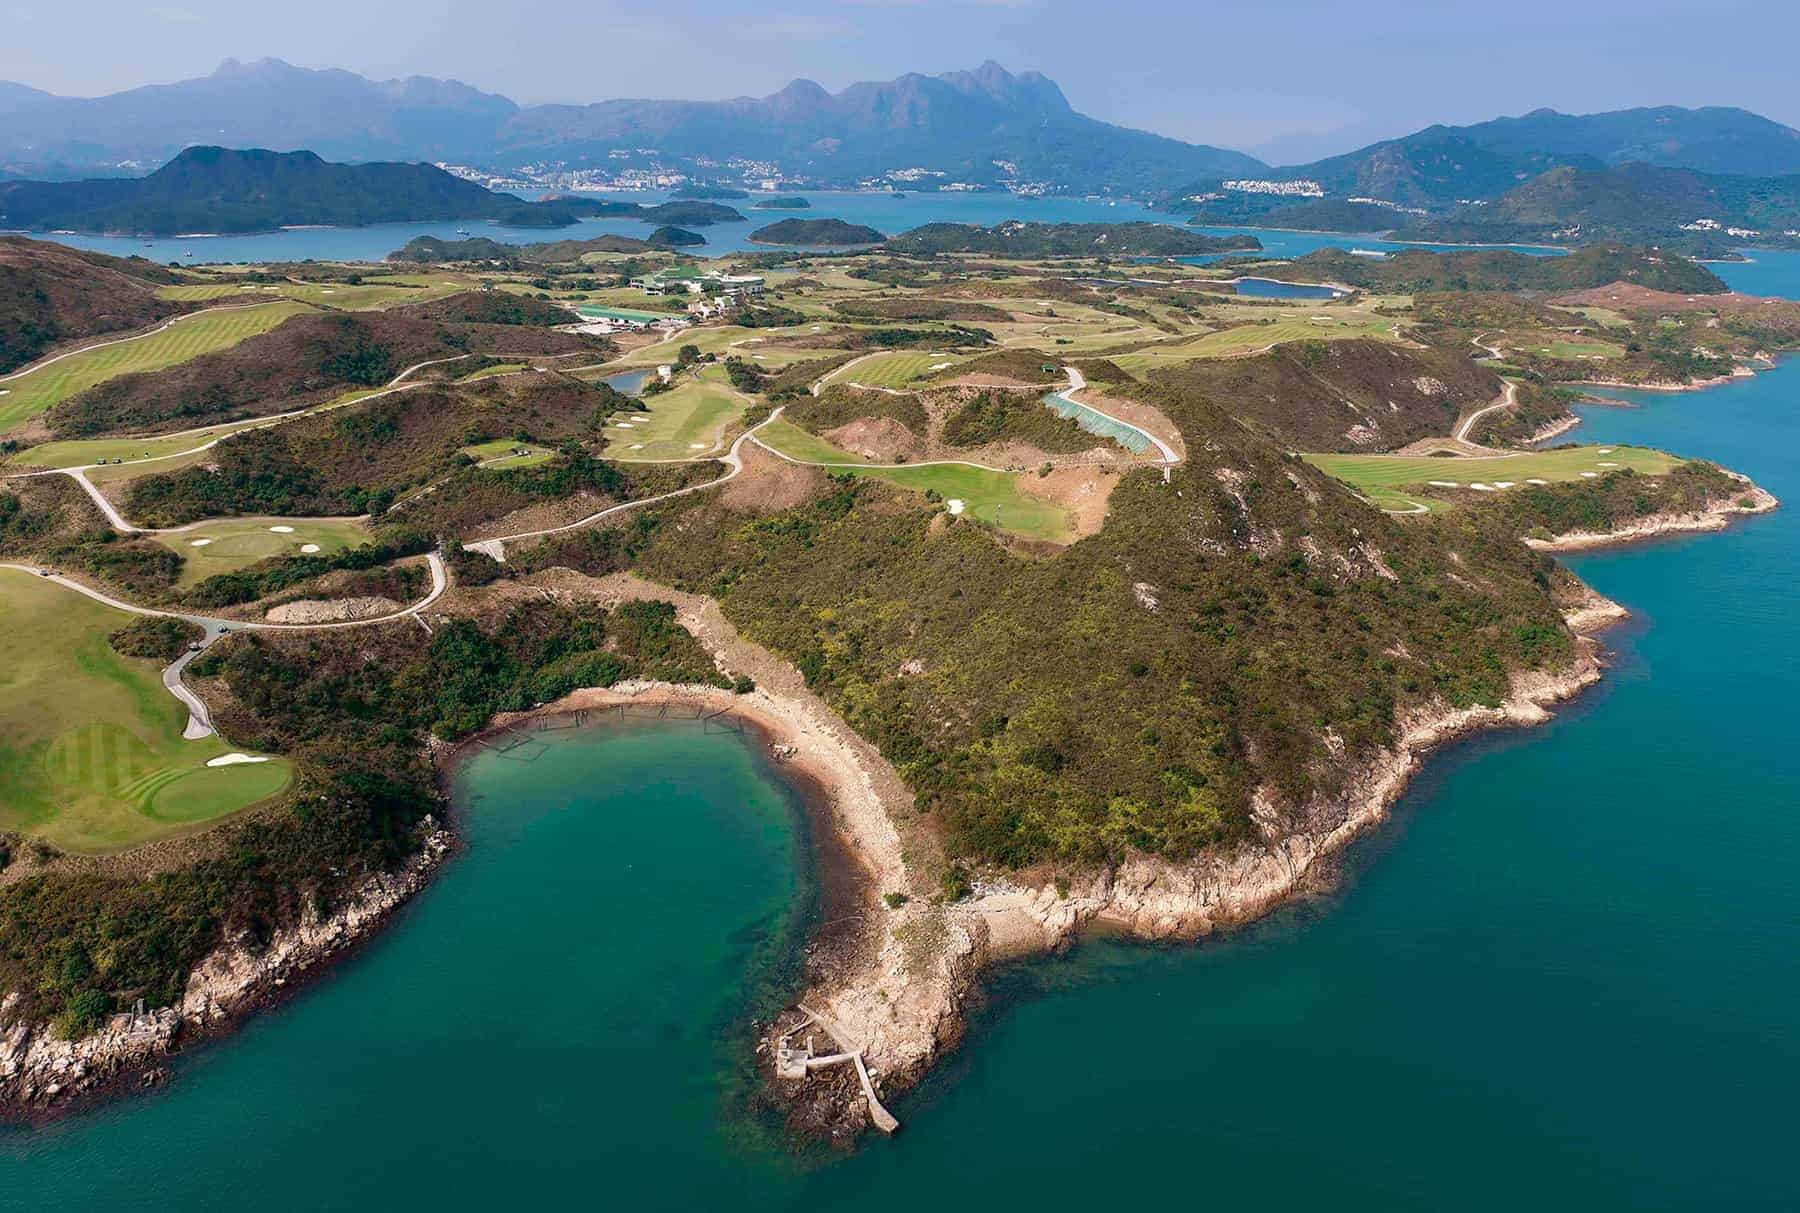 kai sau chou golf course Hong Kong